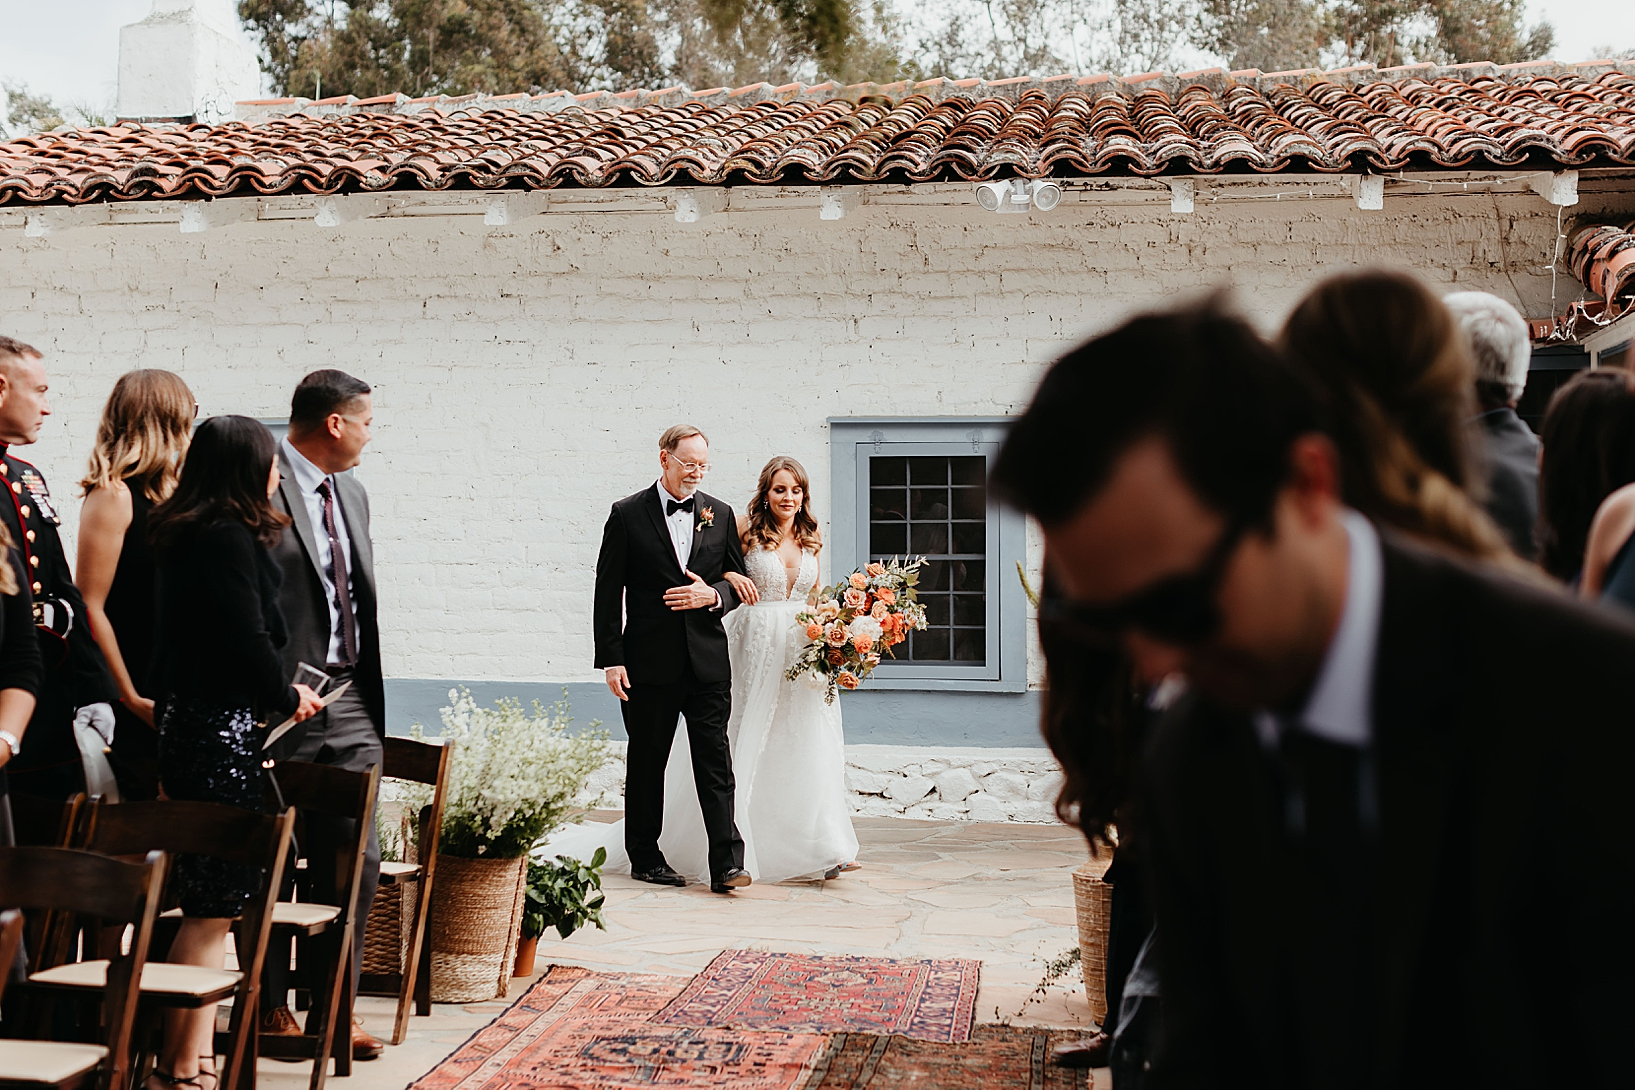 Leo-Carrillo-Ranch-Wedding-49.jpg